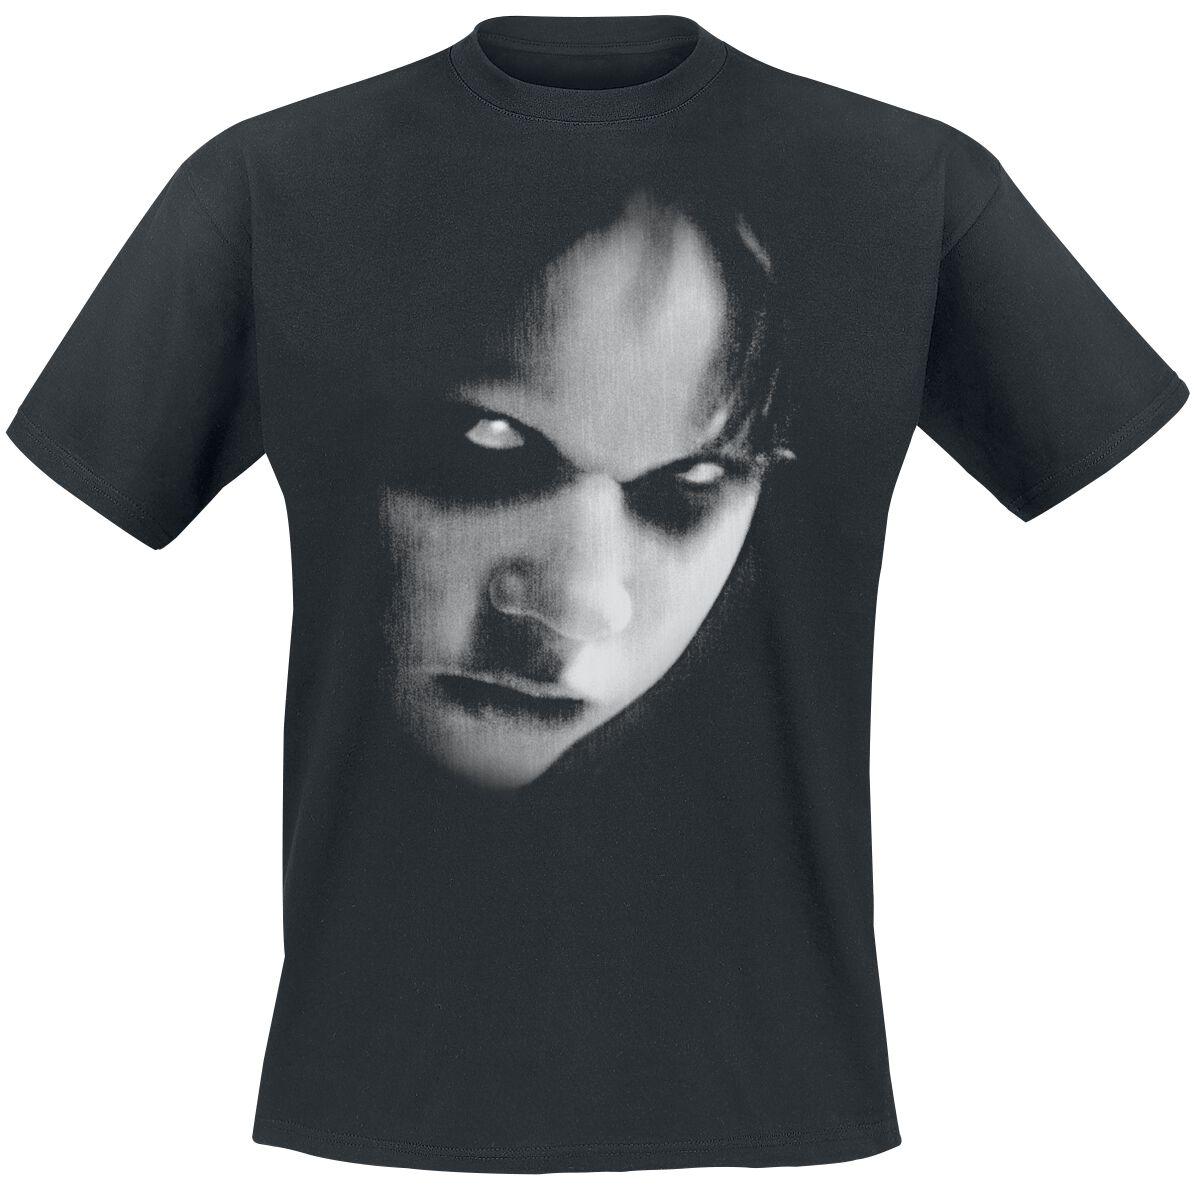 Merch dla Fanów - Koszulki - T-Shirt Der Exorzist Regan T-Shirt czarny - 371793